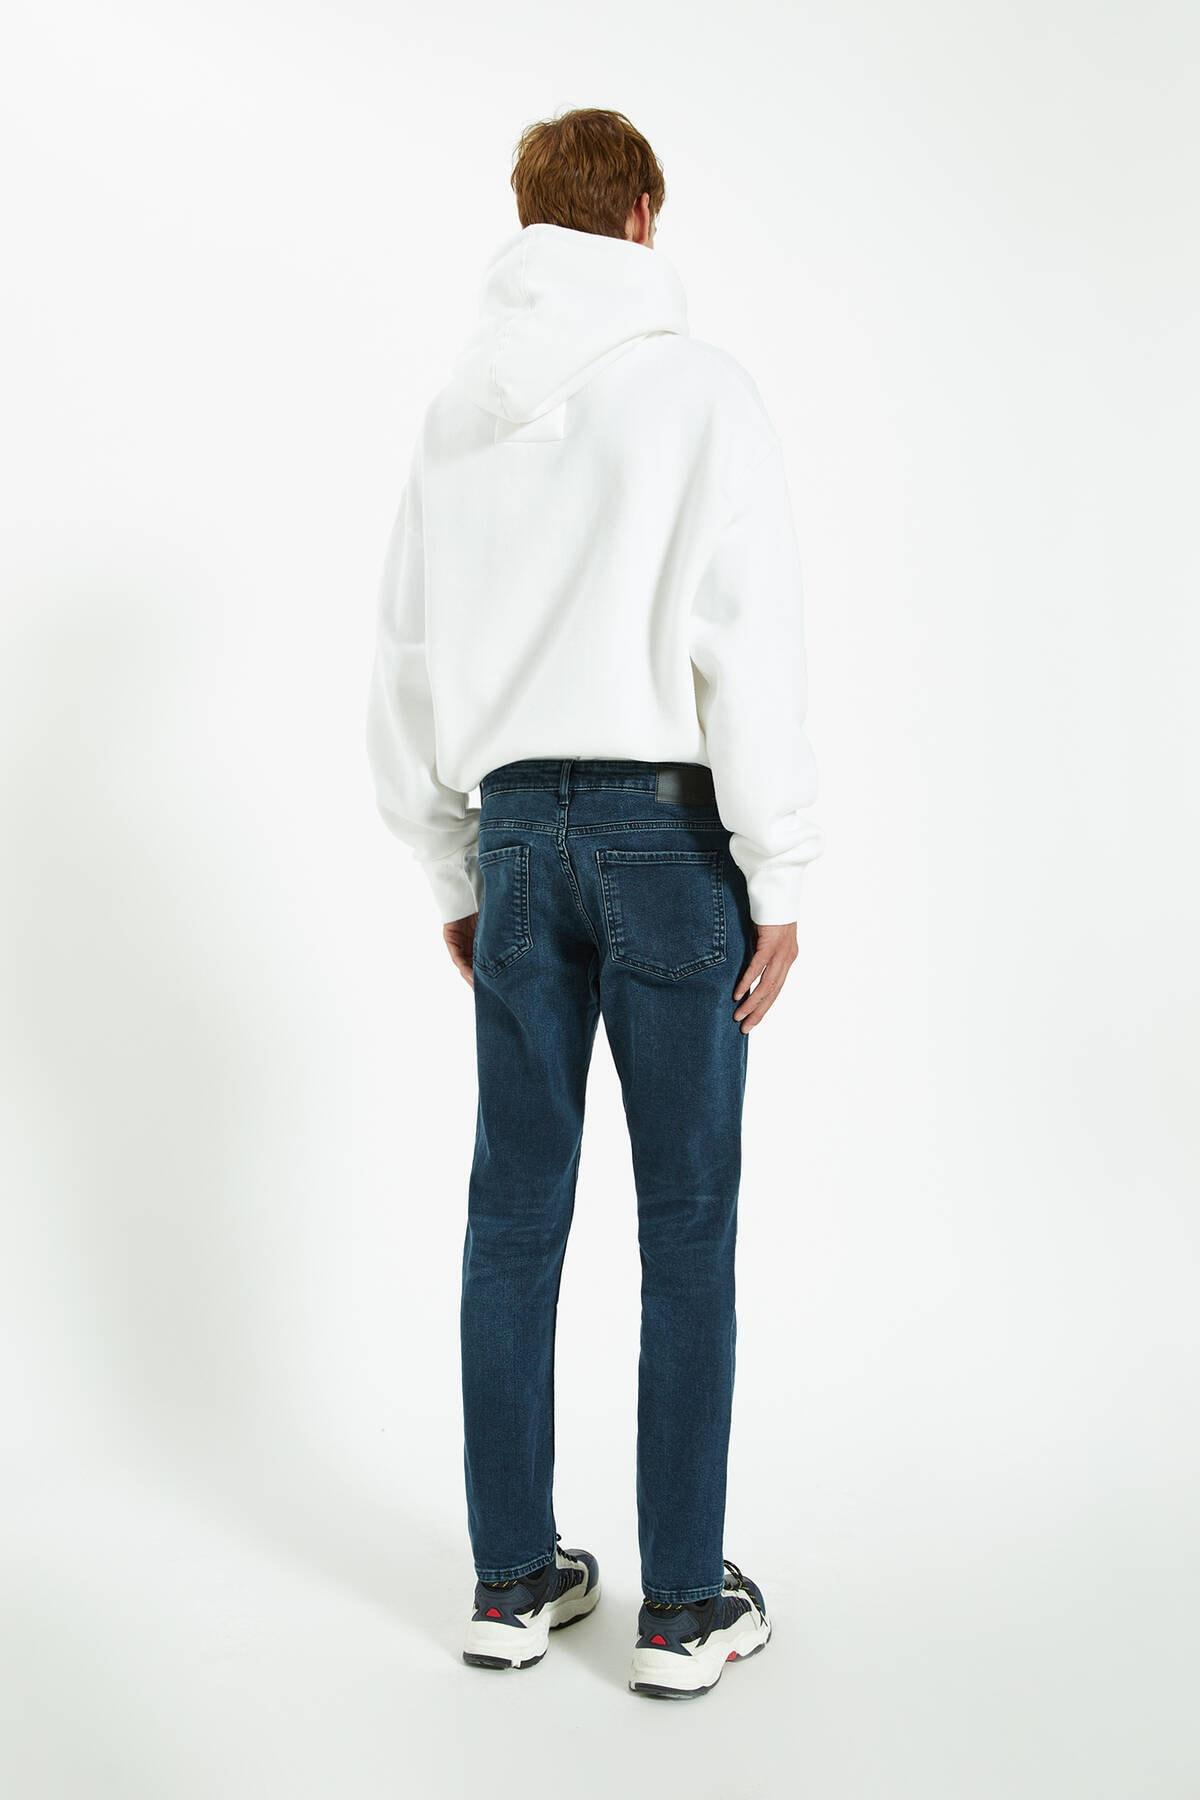 Pull & Bear Erkek Lavanta Rengi Distressed Detaylı Comfort Slim Fit Jean 09683533 3